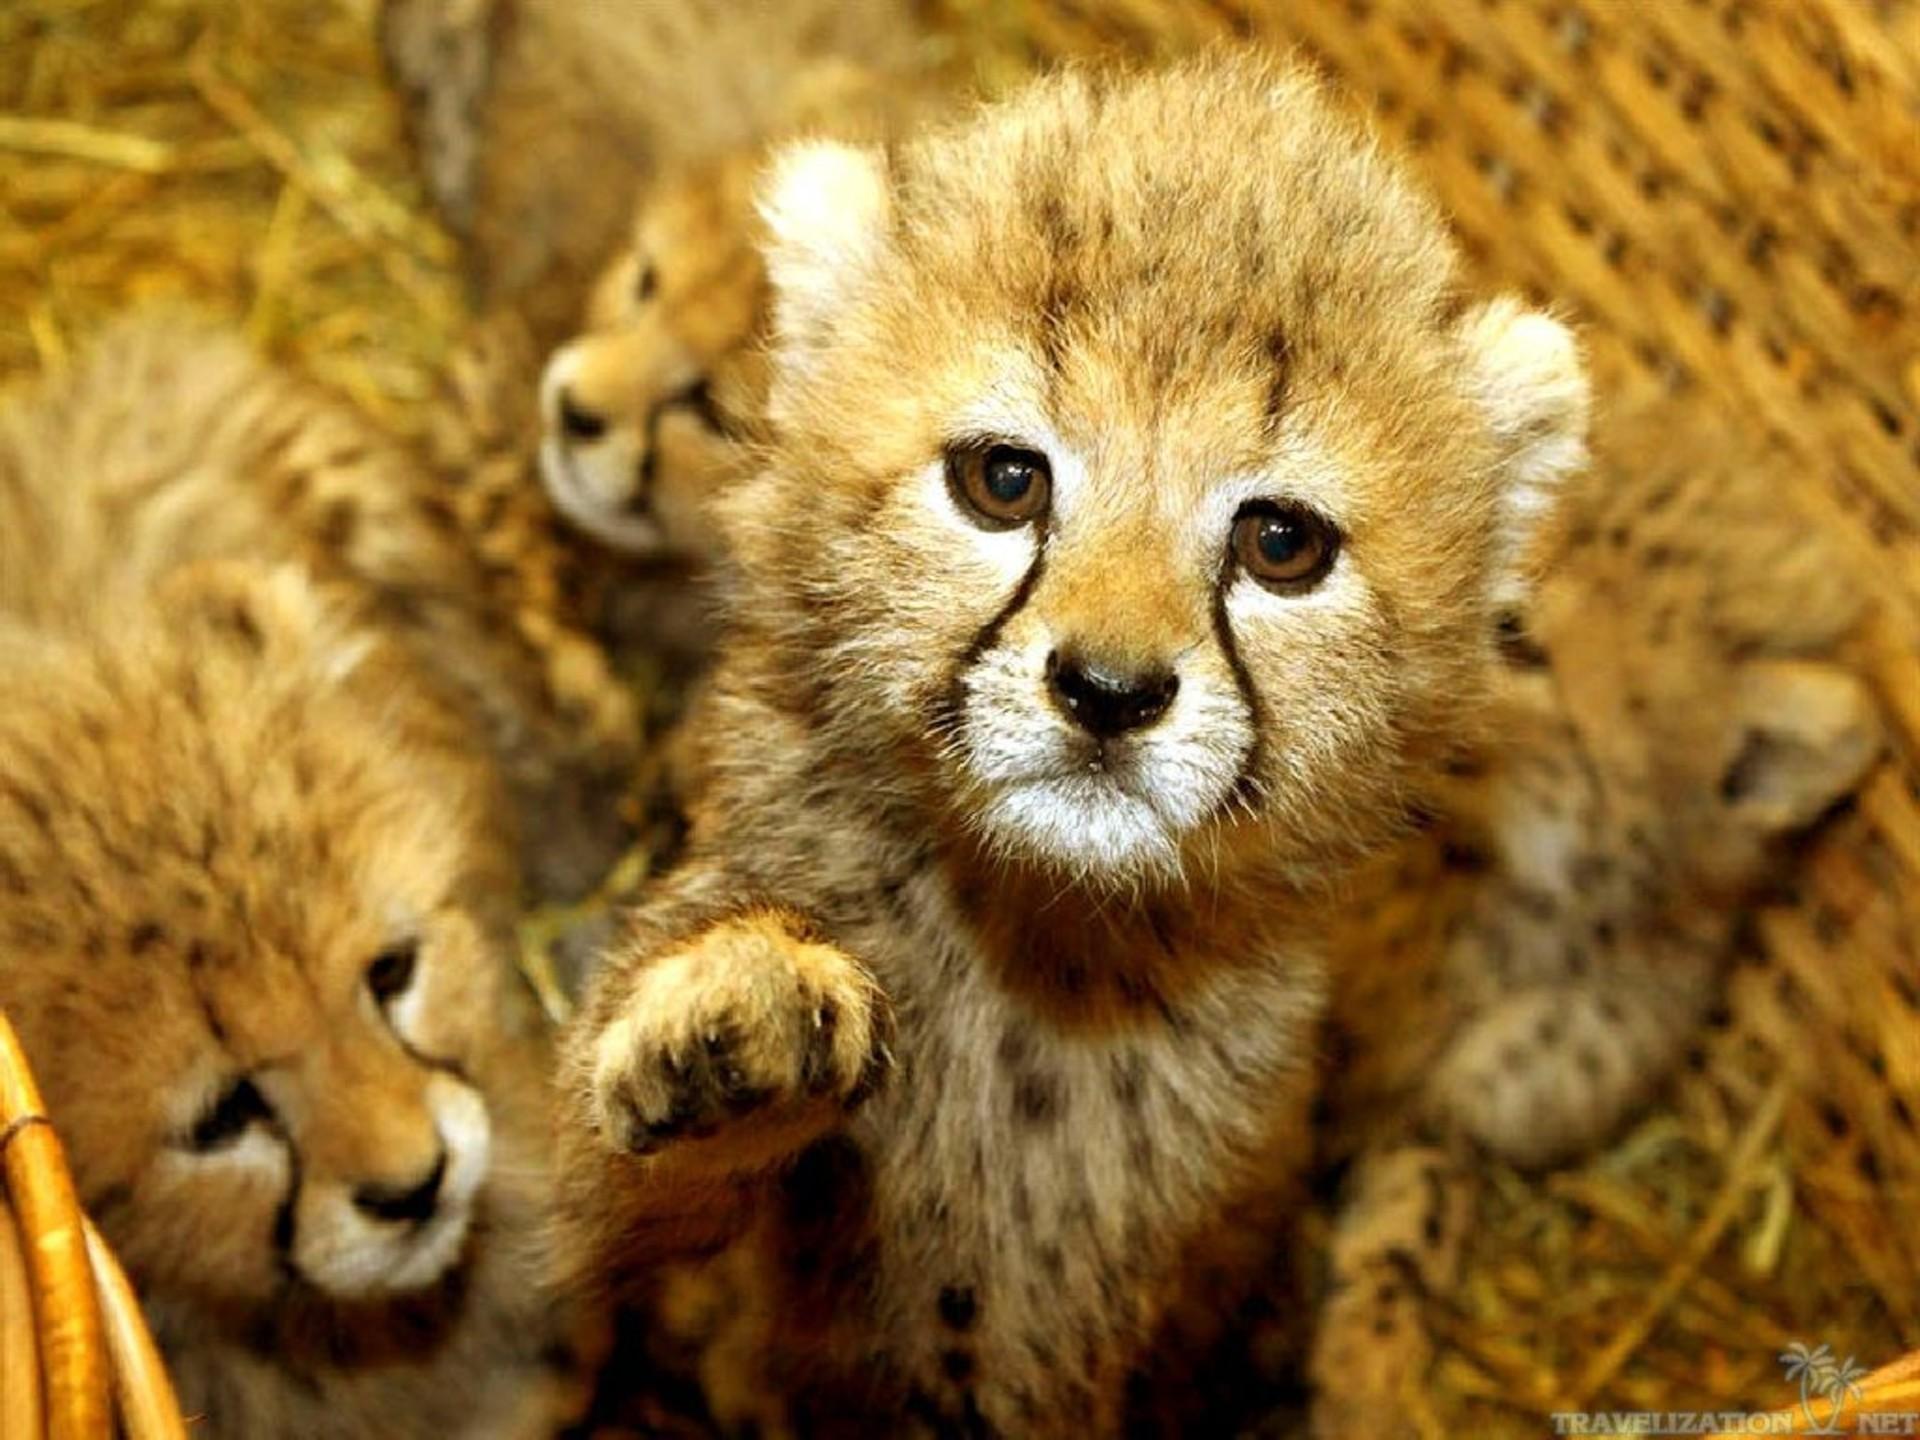 Cute Baby Animal Wallpaper ·① WallpaperTag